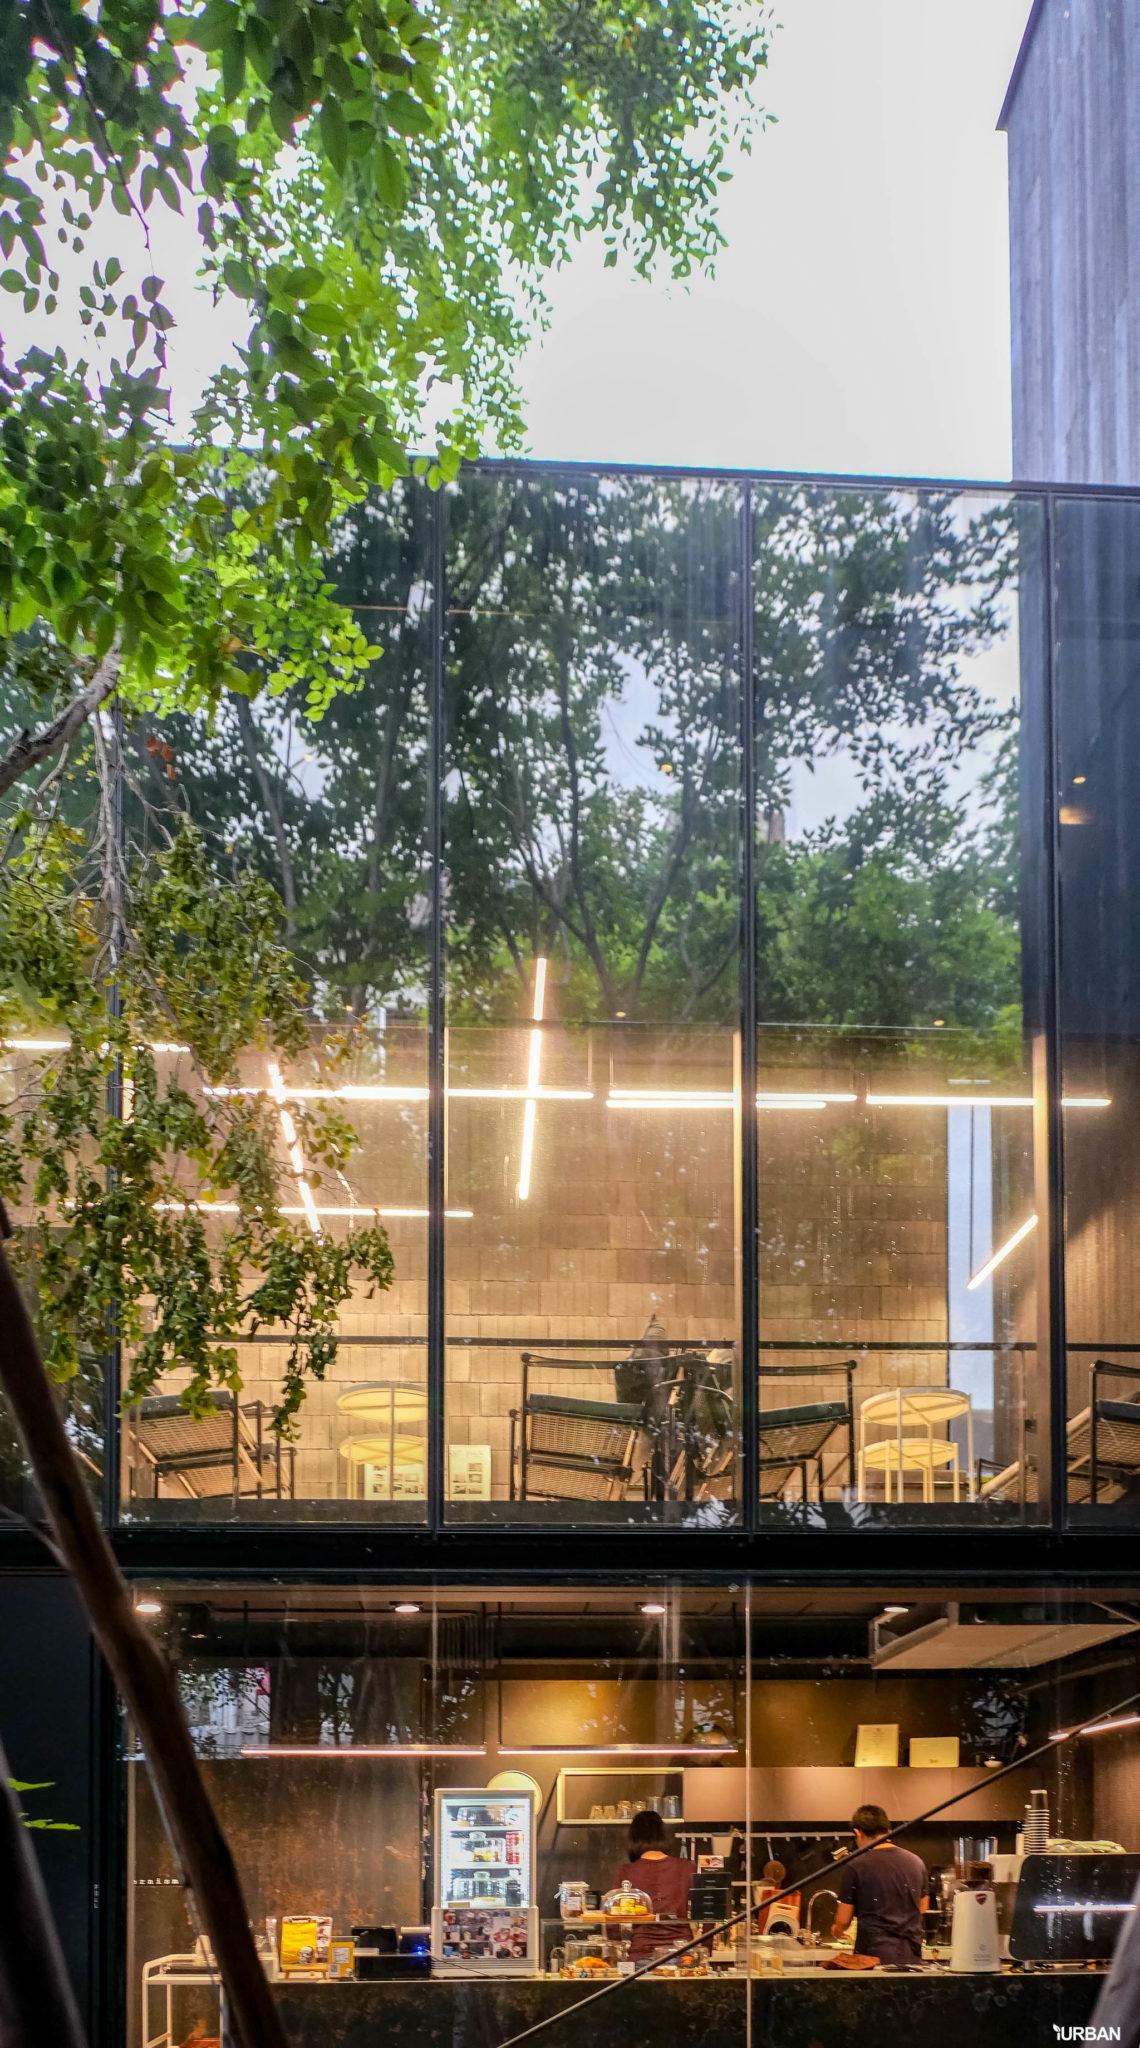 MODERNISM: ARCHITECT CAFE คาเฟ่ที่จะทำให้คุณได้ทึ่งพร้อมสัมผัสของจริงกับงานสถาปัตยกรรมสไตล์ modern 15 -